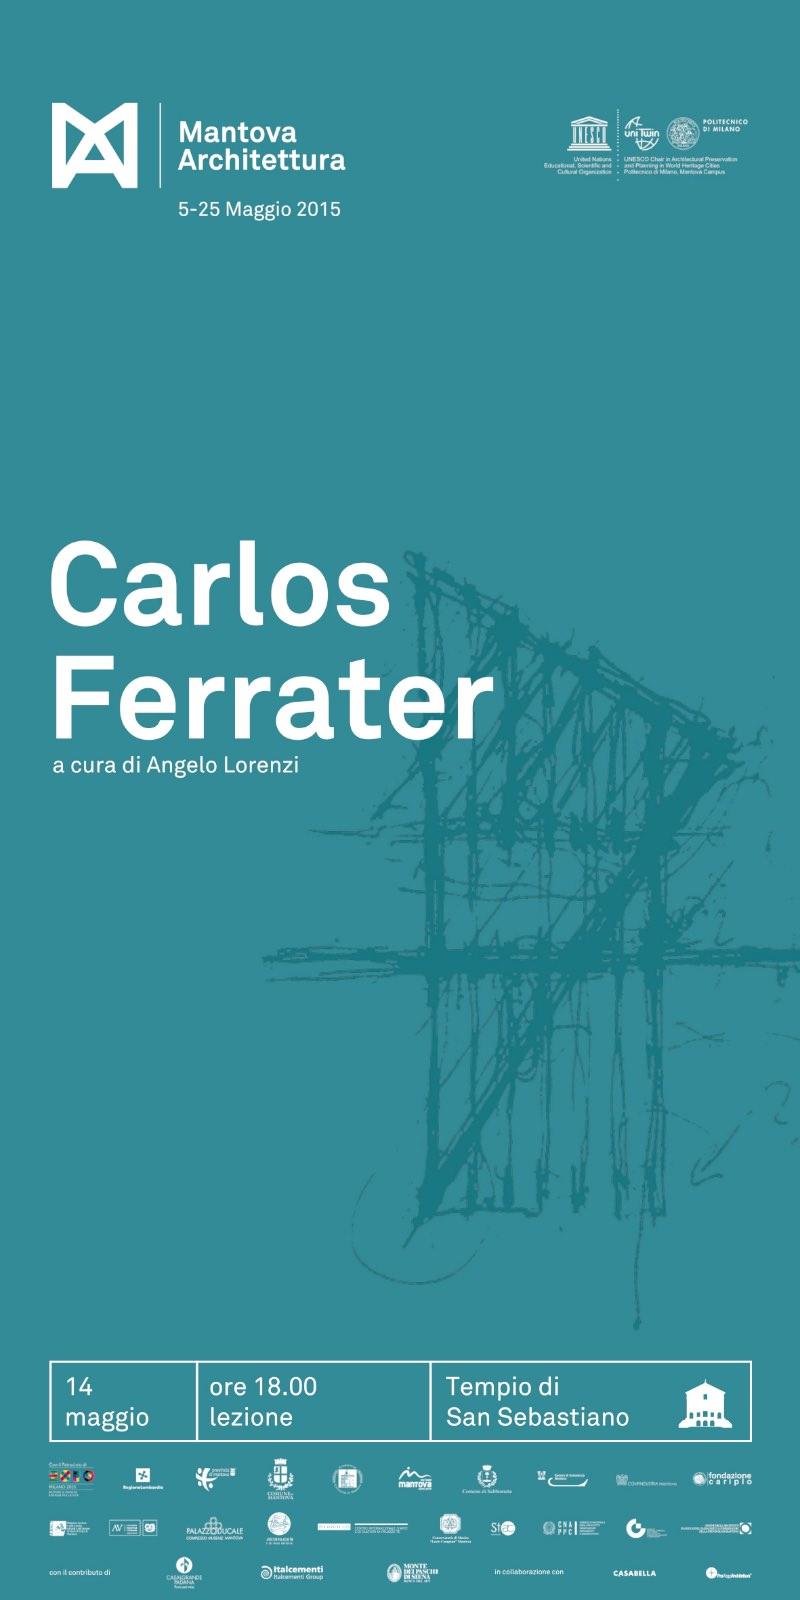 locandina Carlos Ferrater Mantova Architettura 2015 imagecredits mantovarchitettura.polimi.it